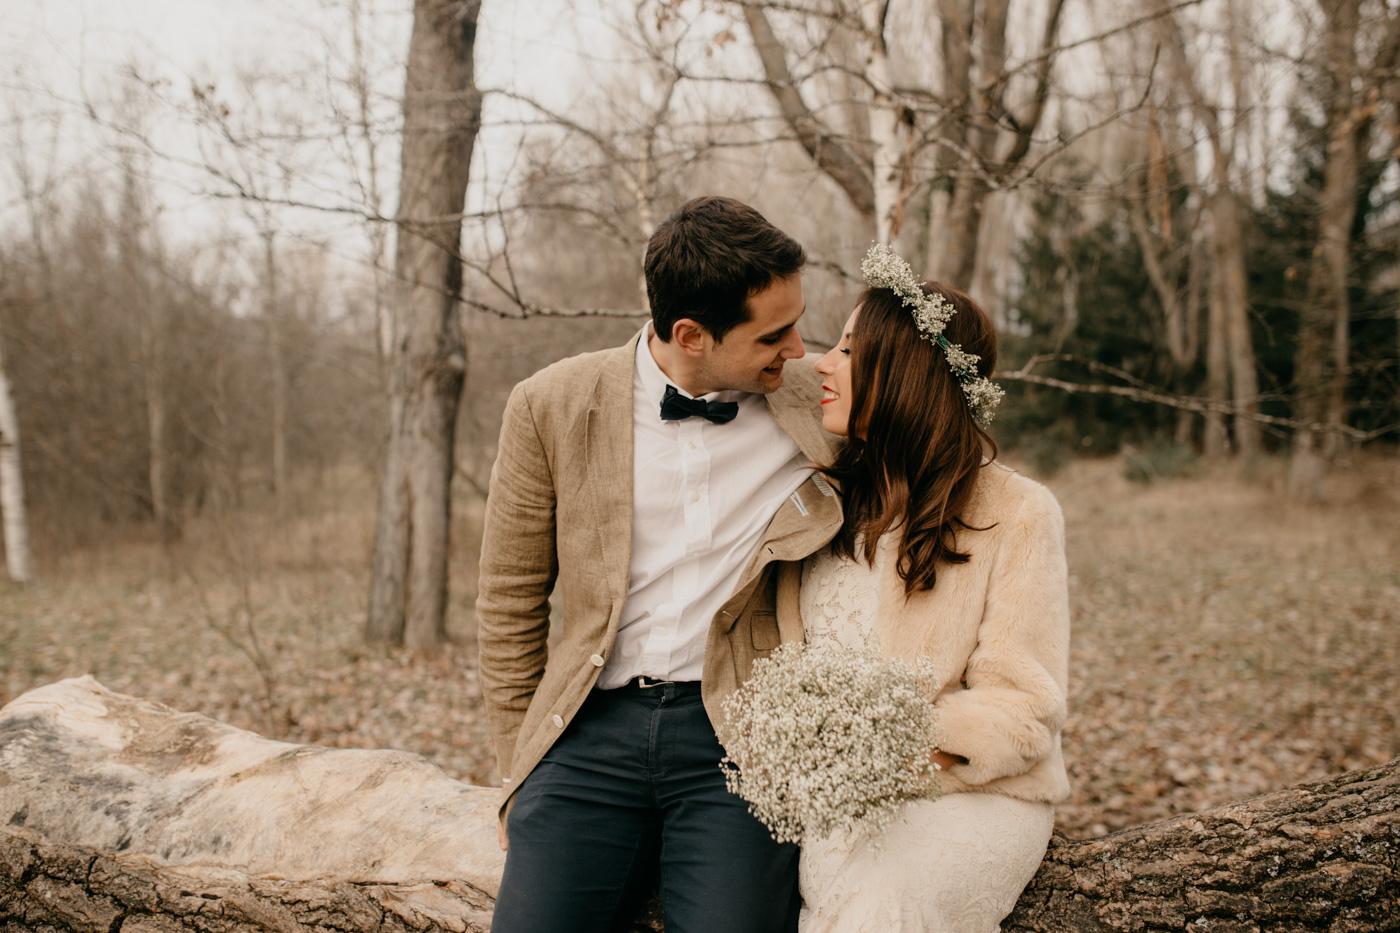 Velvet-Hush-fotografos-boda-al-aire-libre-madrid-102